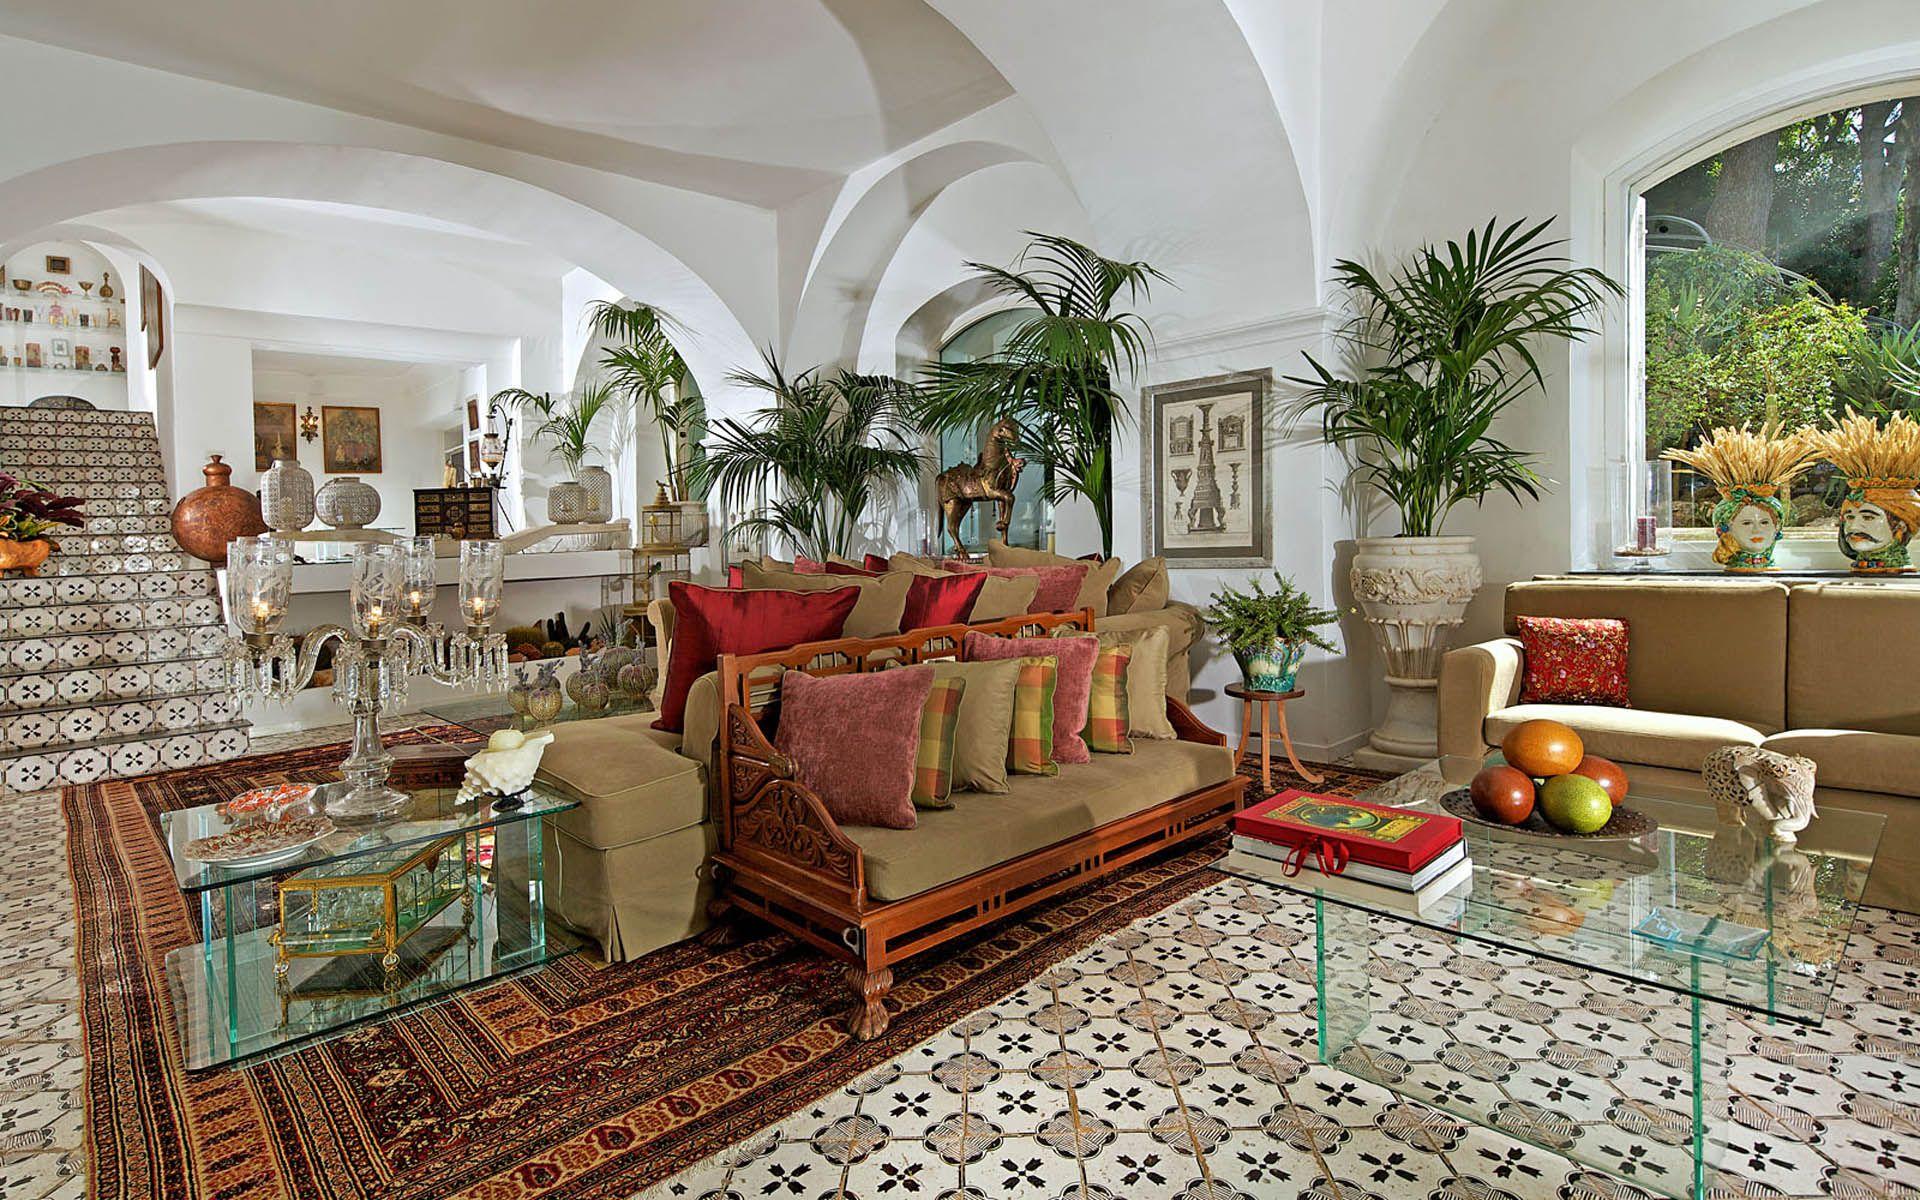 Villa Le Scale Capri Italy is a luxury villa with its own swimming